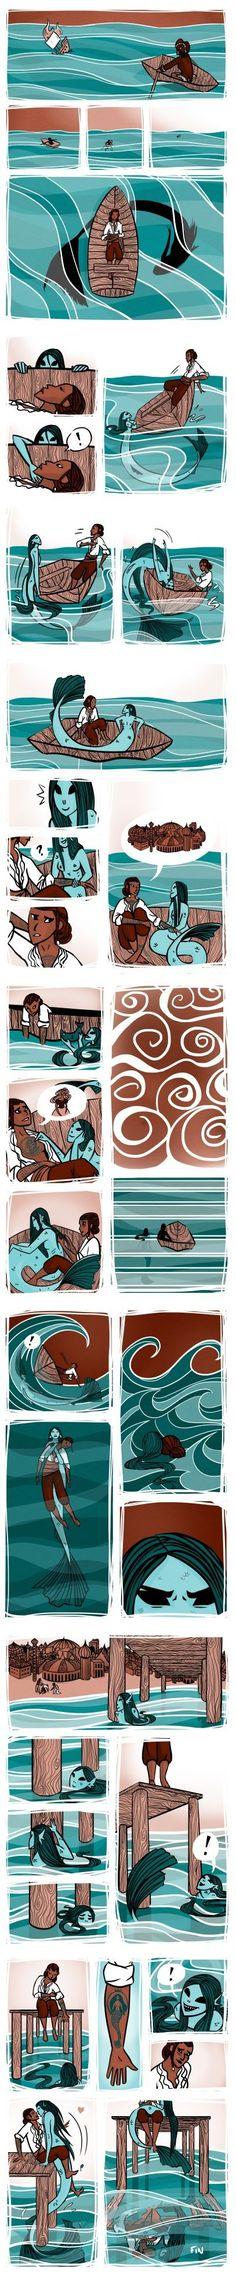 Aww, True love between man and mermaid. - Aww, True love between man and mermaid. Comics Story, Bd Comics, Cute Comics, Cute Stories, Short Stories, Short Comics, Merfolk, Comic Strips, Amazing Art